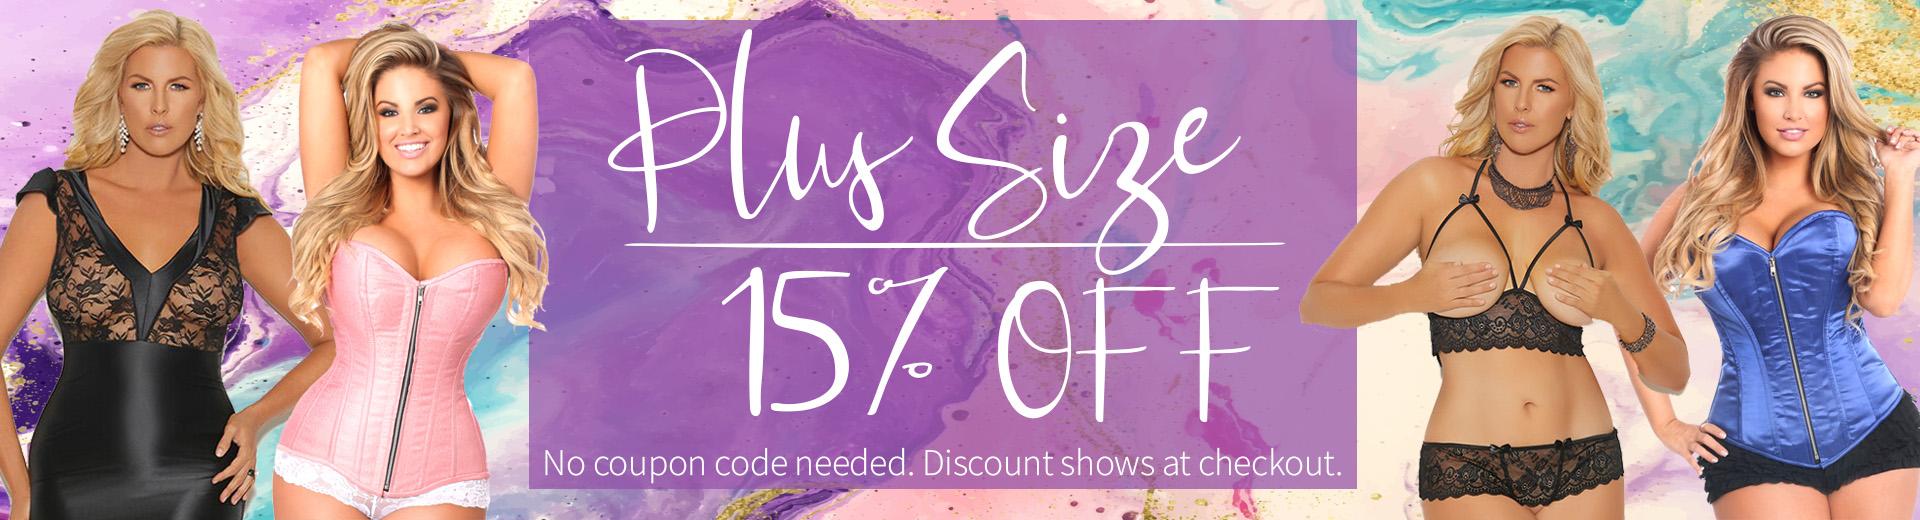 15% off all plus size items MyStripperCloset.com